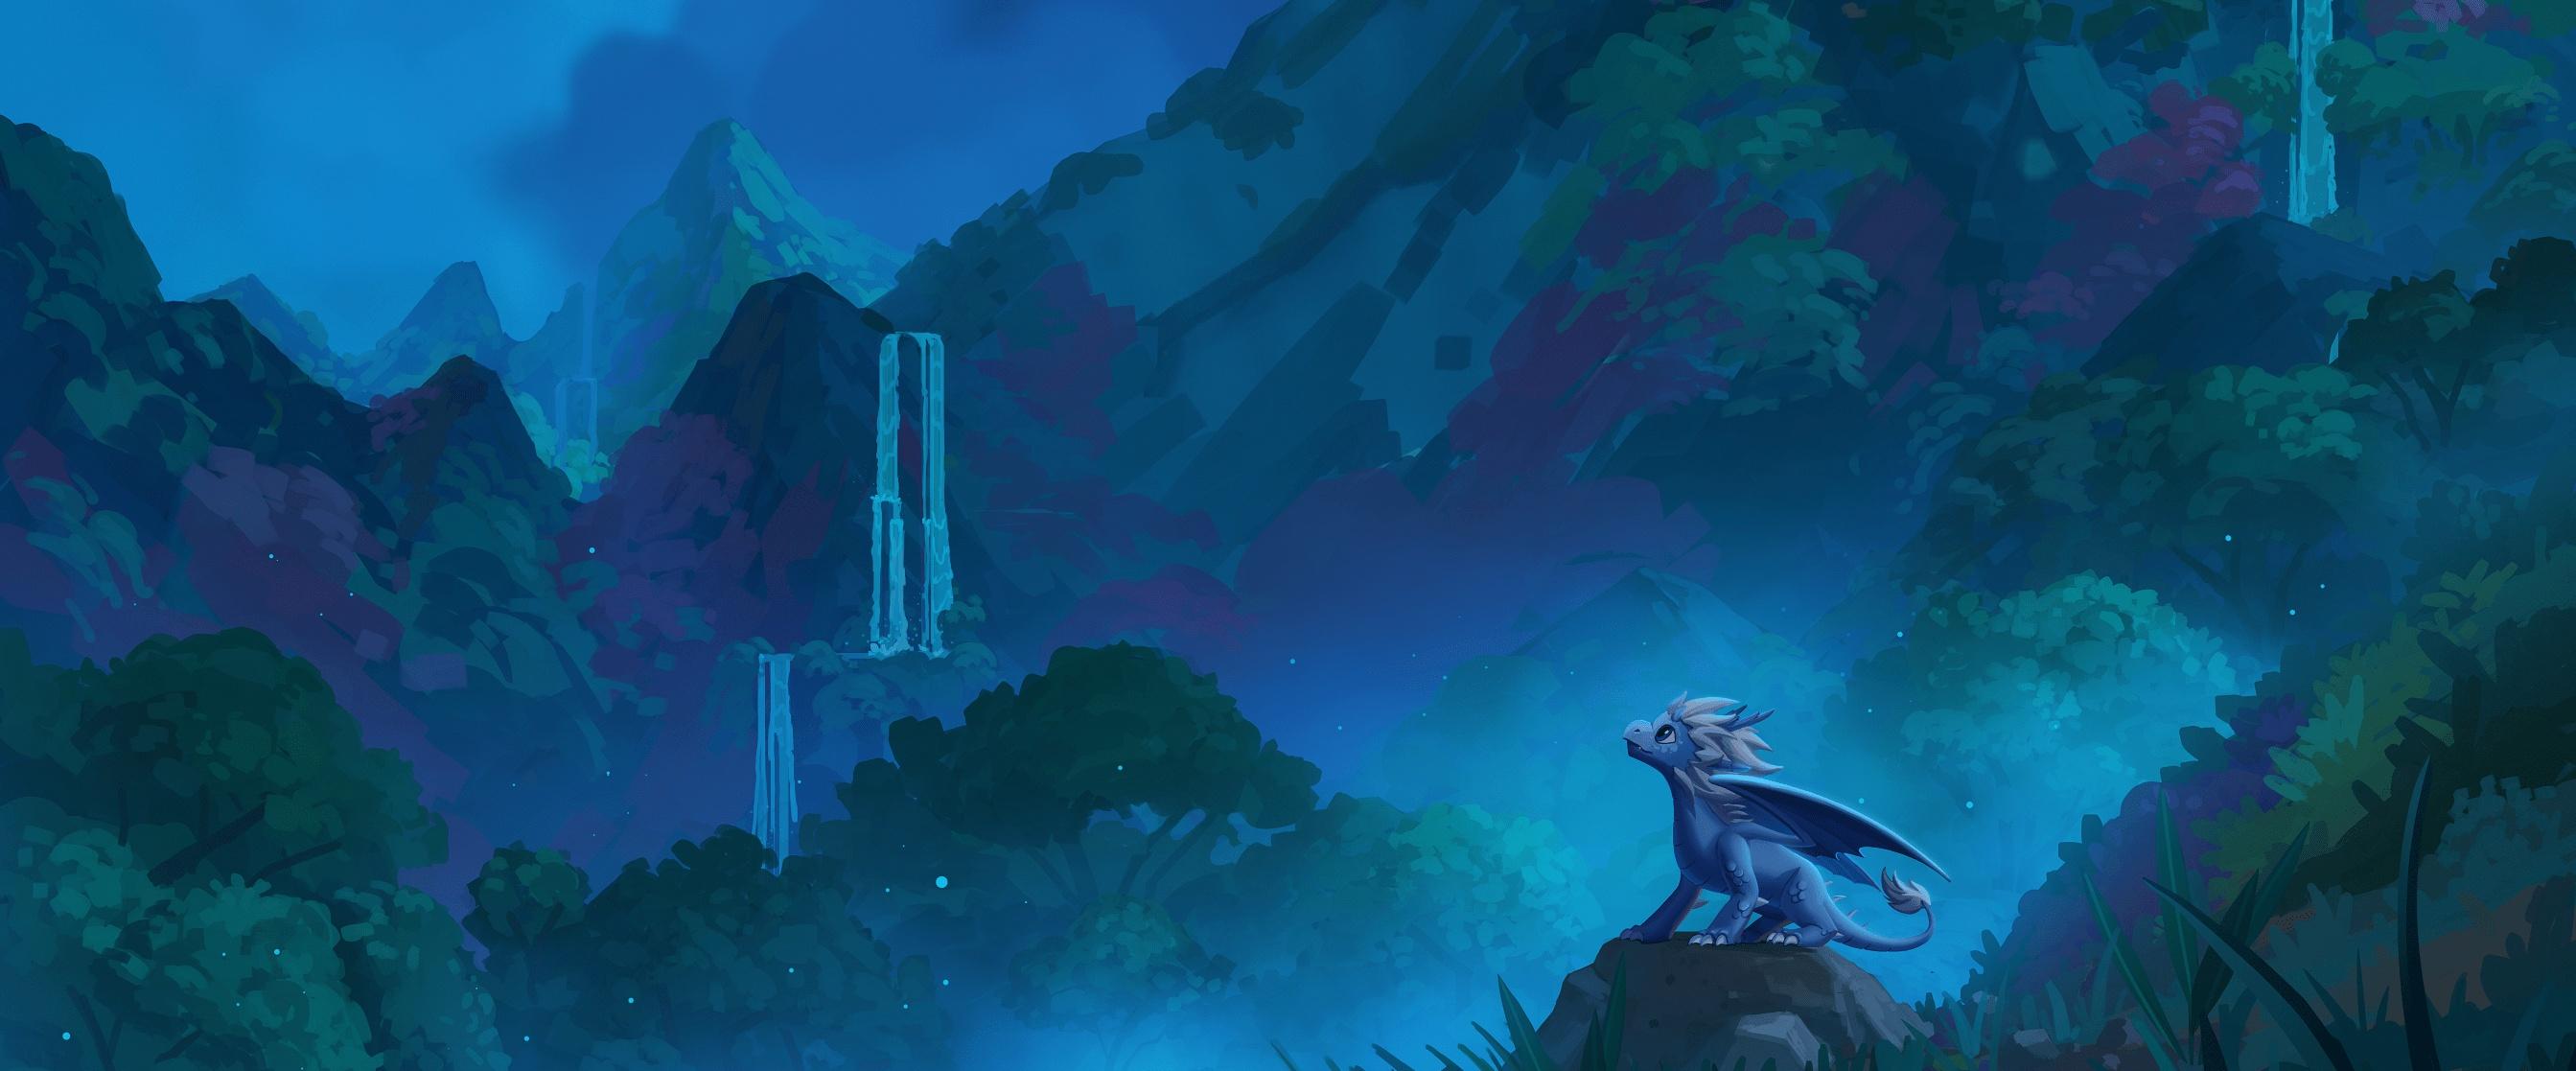 The Dragon Prince free wallpaper